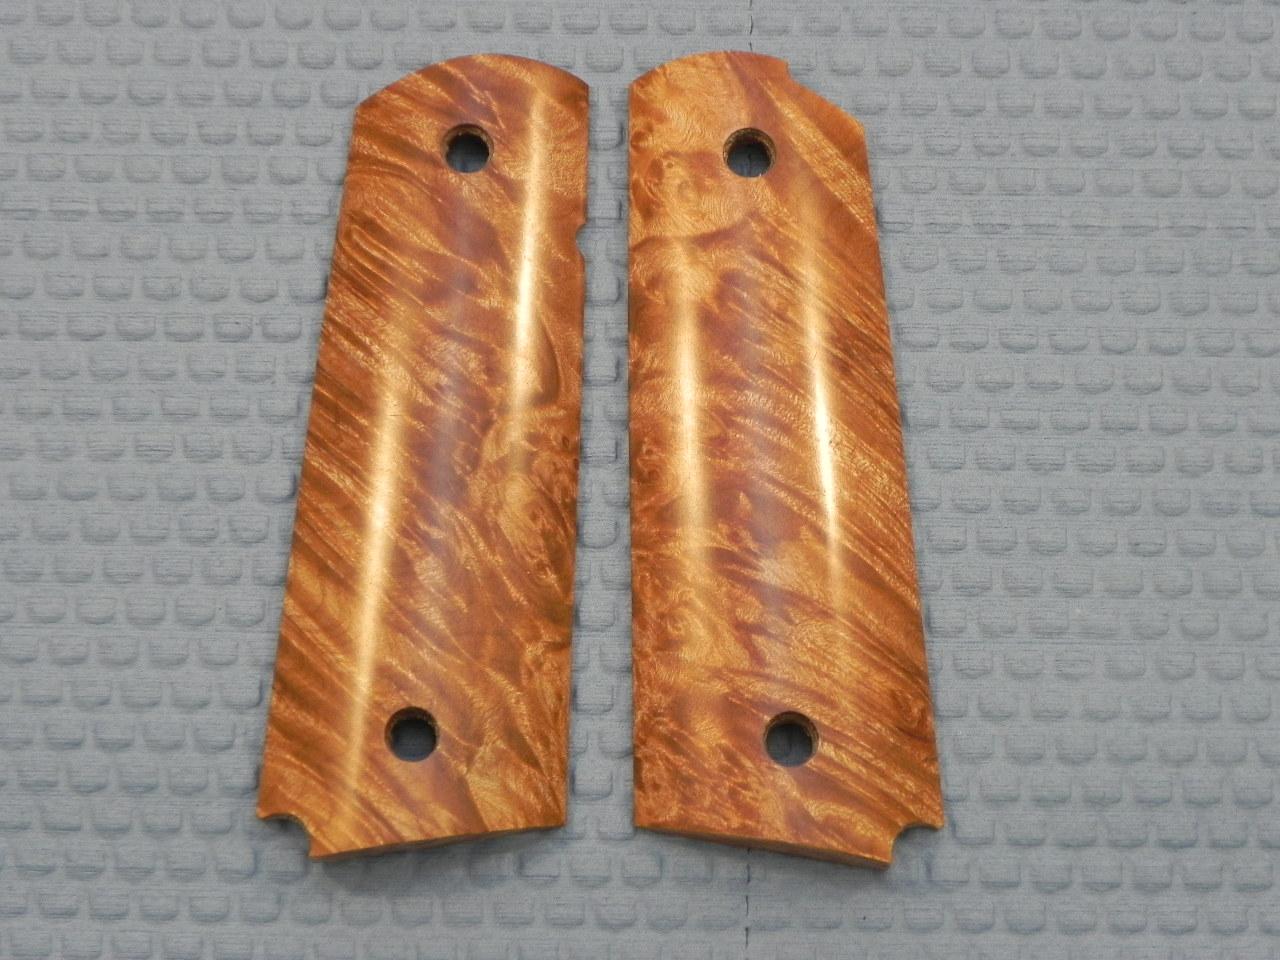 Premium Handmade 1911 Grips - Cylinder & Slide - Handguns parts and